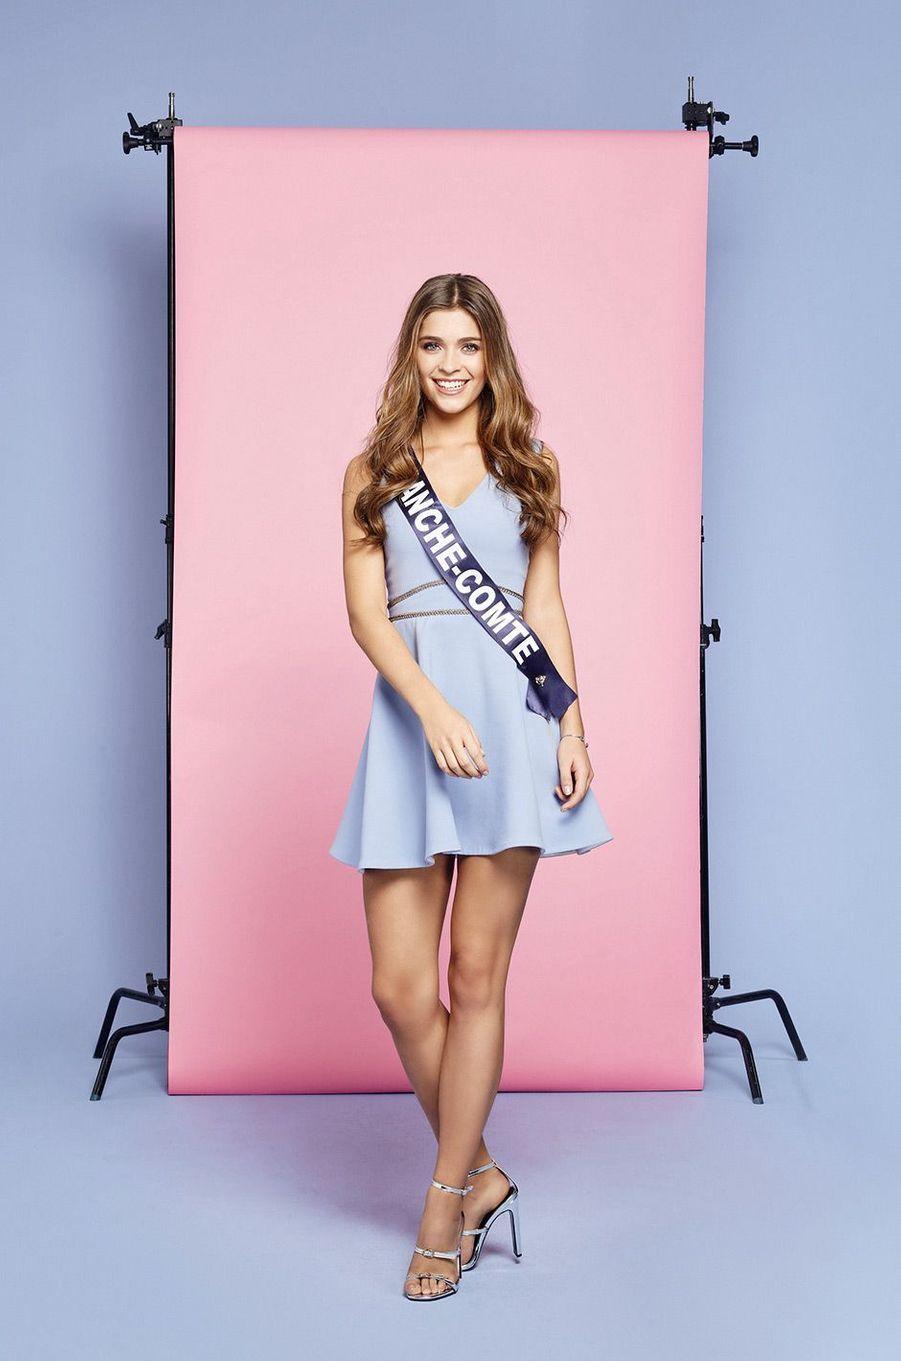 Miss Franche-Comté: Lauralyne Demesmay